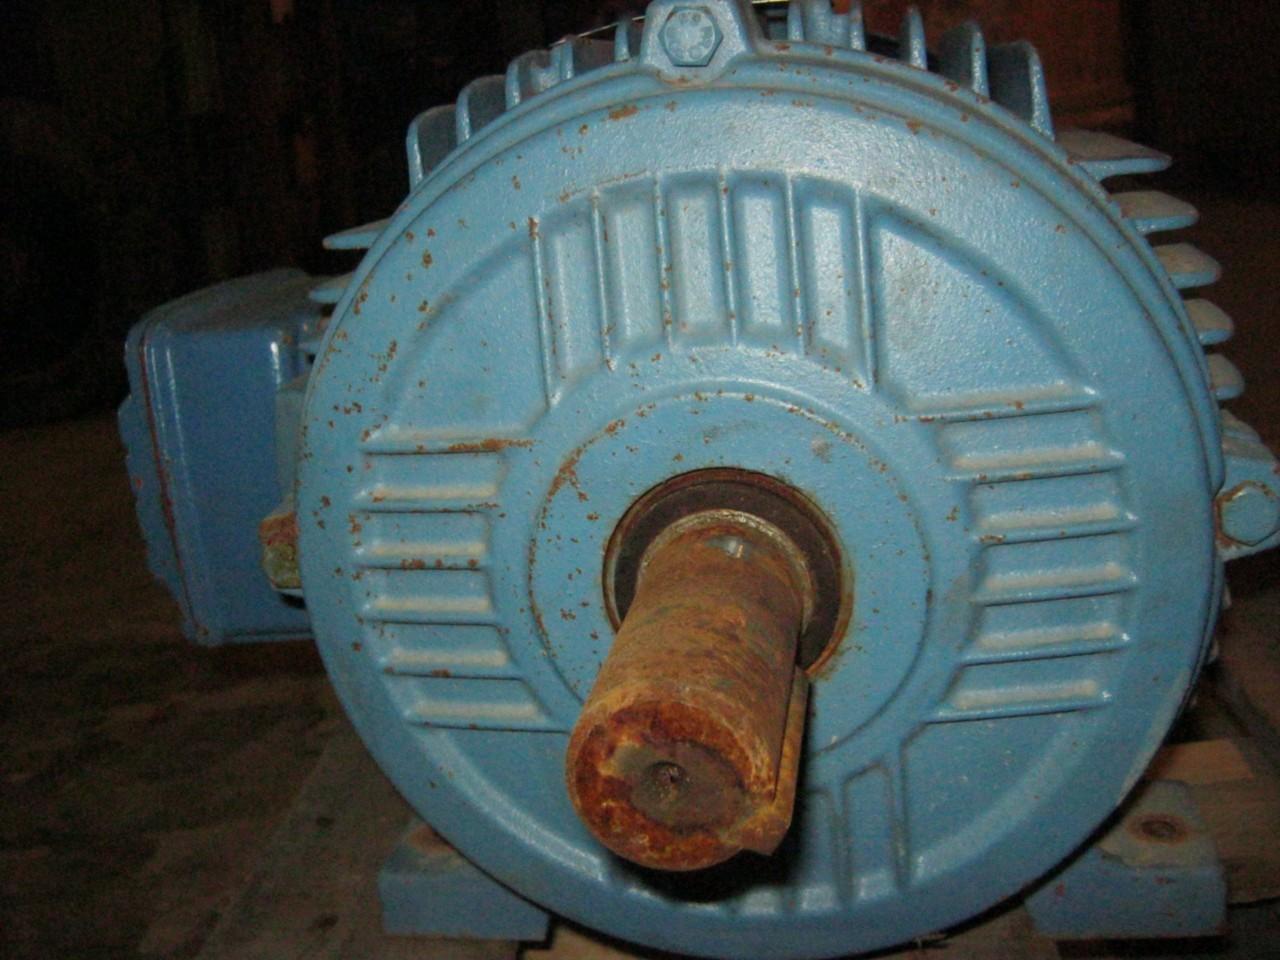 Weg w21 severe duty ac motor 10hp ebay for Weg severe duty motor